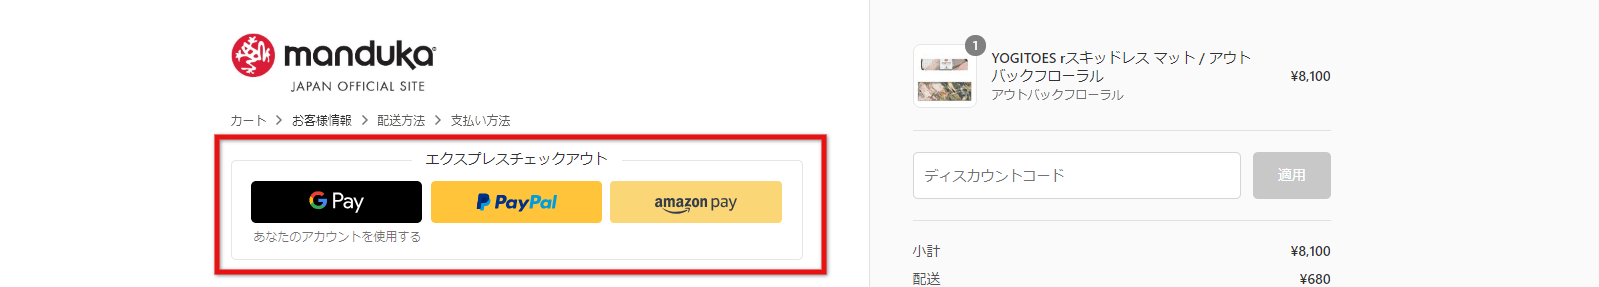 expresspay - Manduka 日本公式サイト サイトリニューアルのお知らせ